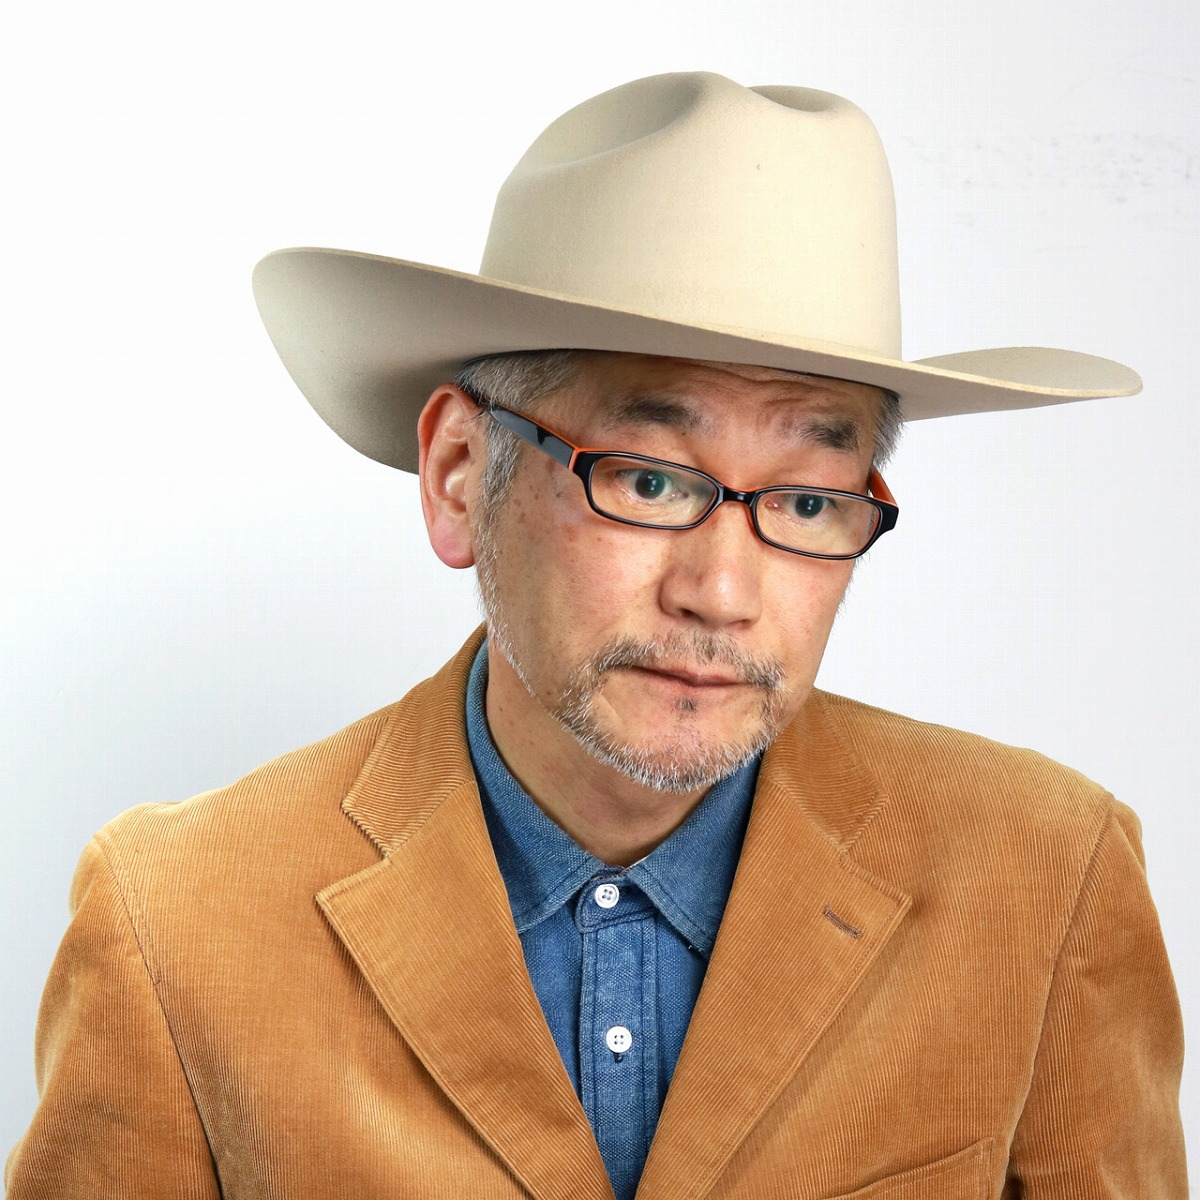 Brand Gentleman Ivory White Vaughn Cowboy Hat Stetson Hat Mail Order Man Hat Christmas Gift Present Made In The Cowboy Hat Men Stetson Hat